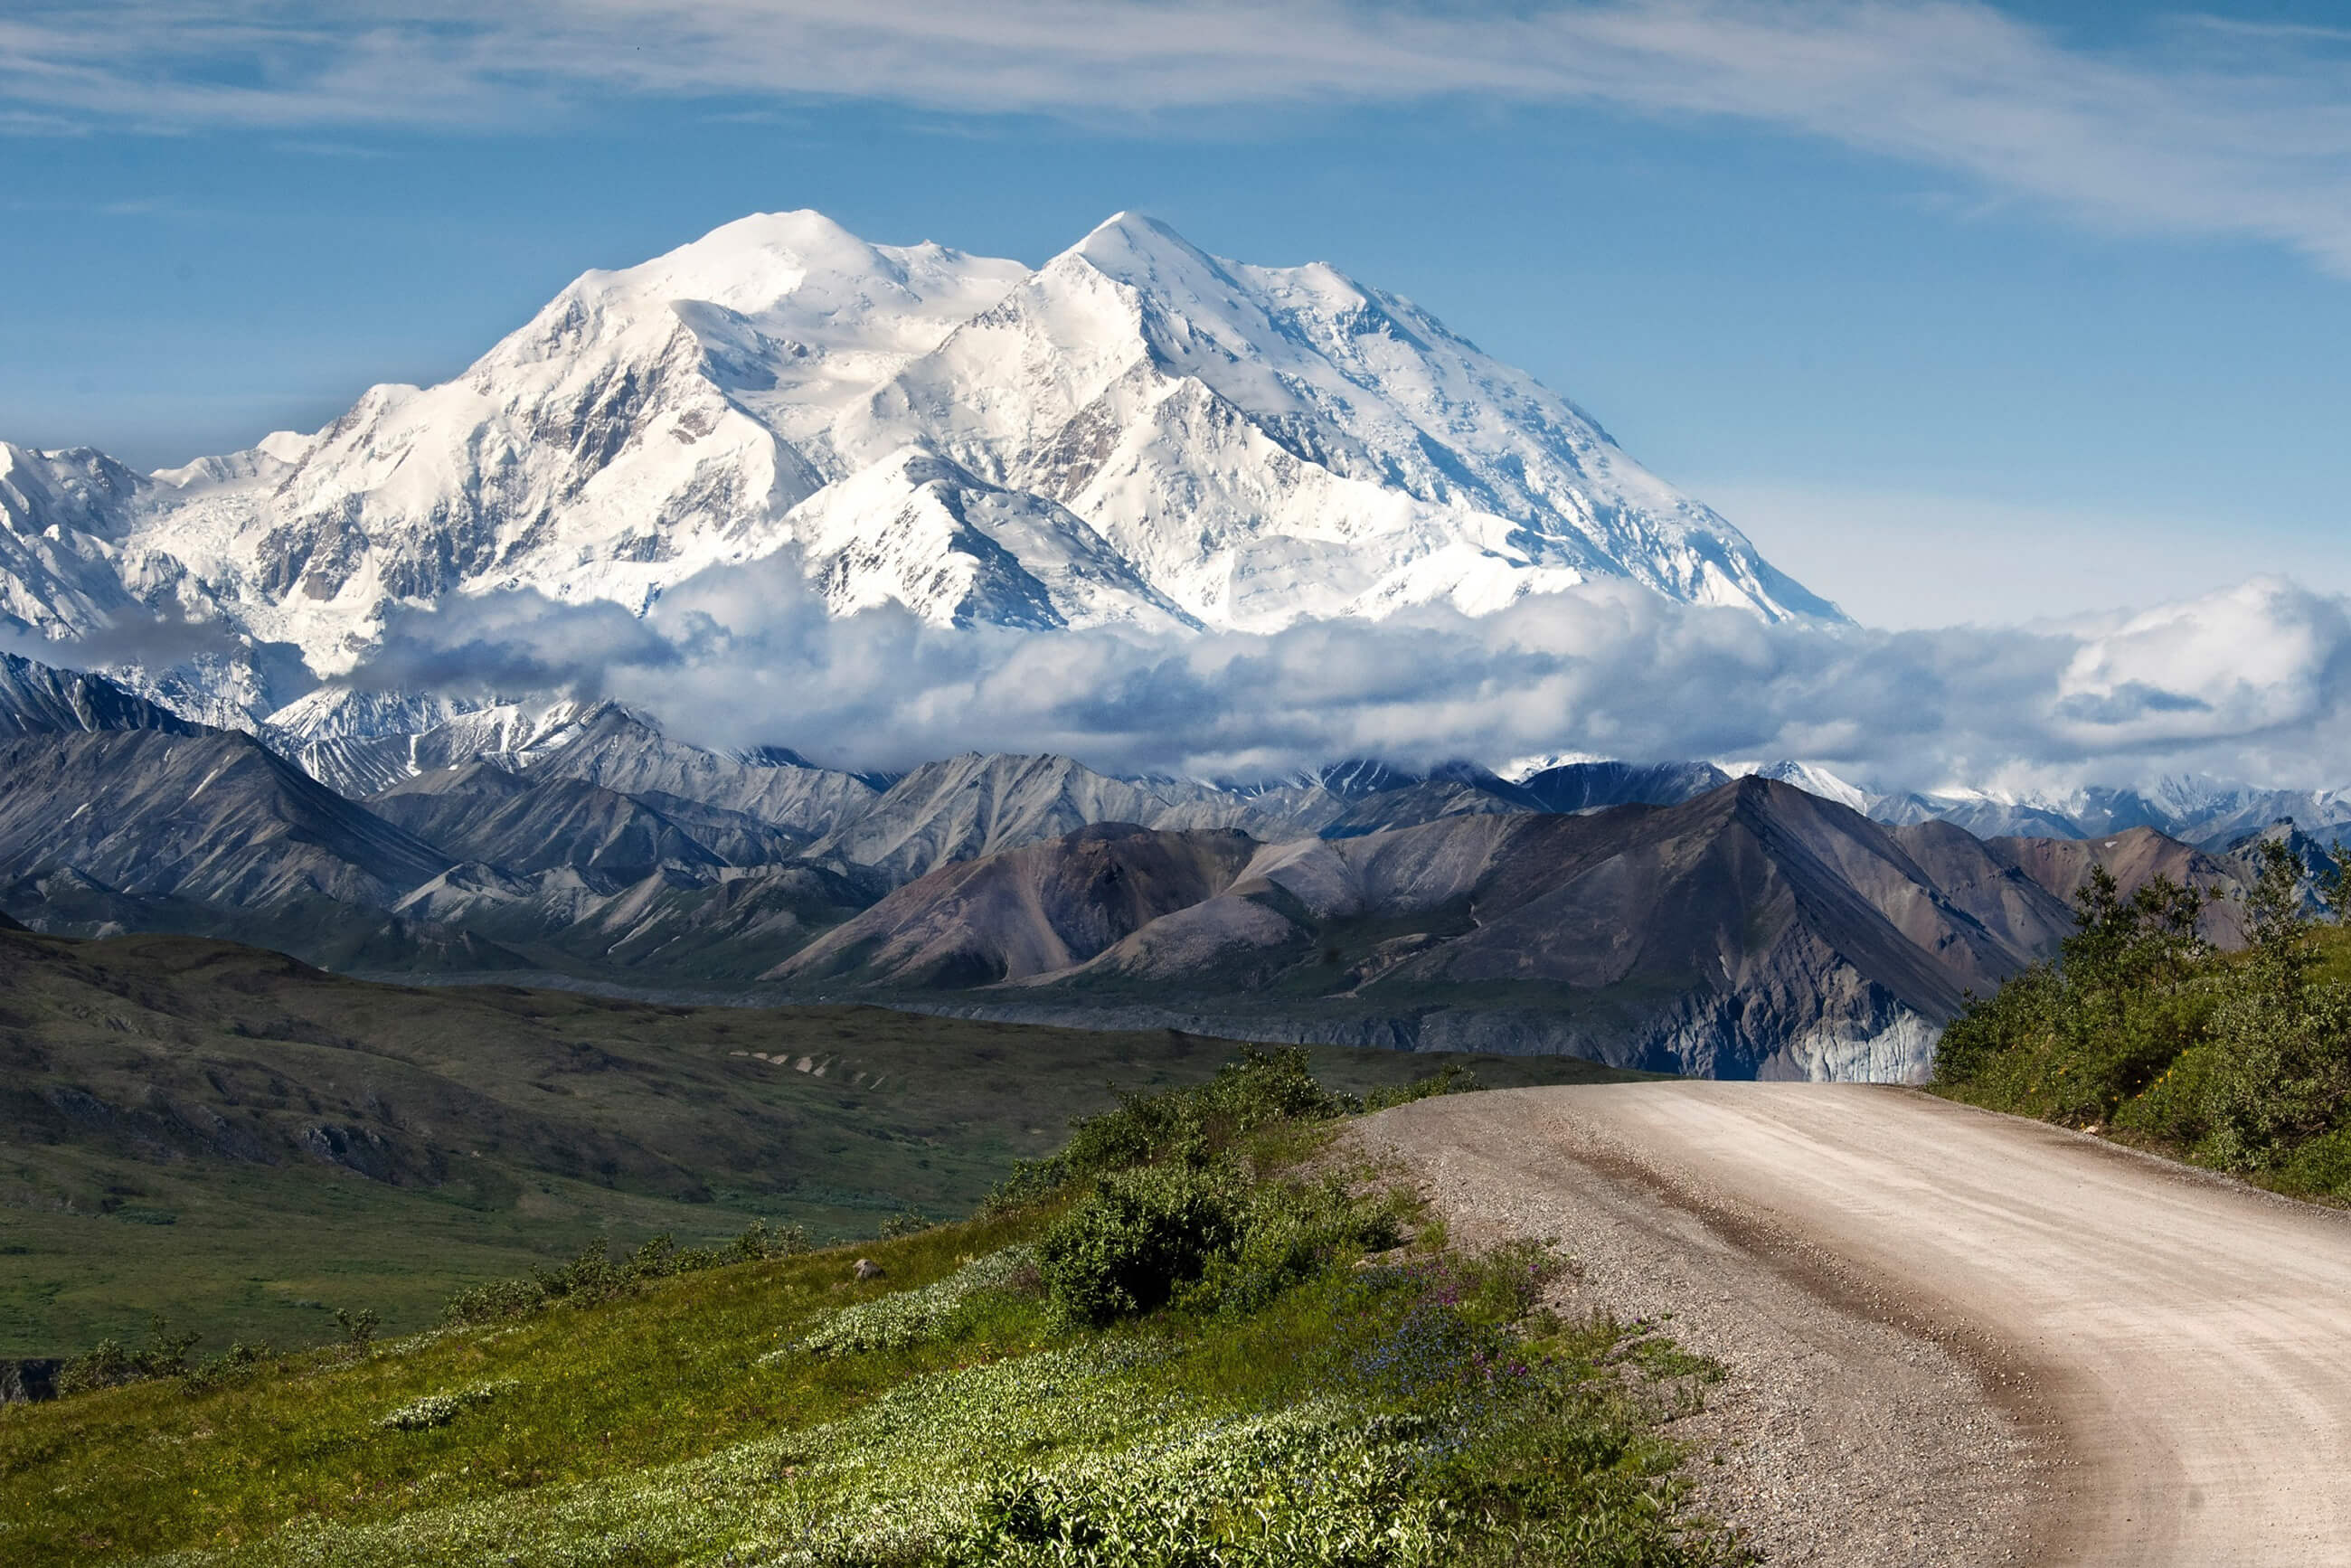 https://bubo.sk/uploads/galleries/16052/mountains-1622731.jpg